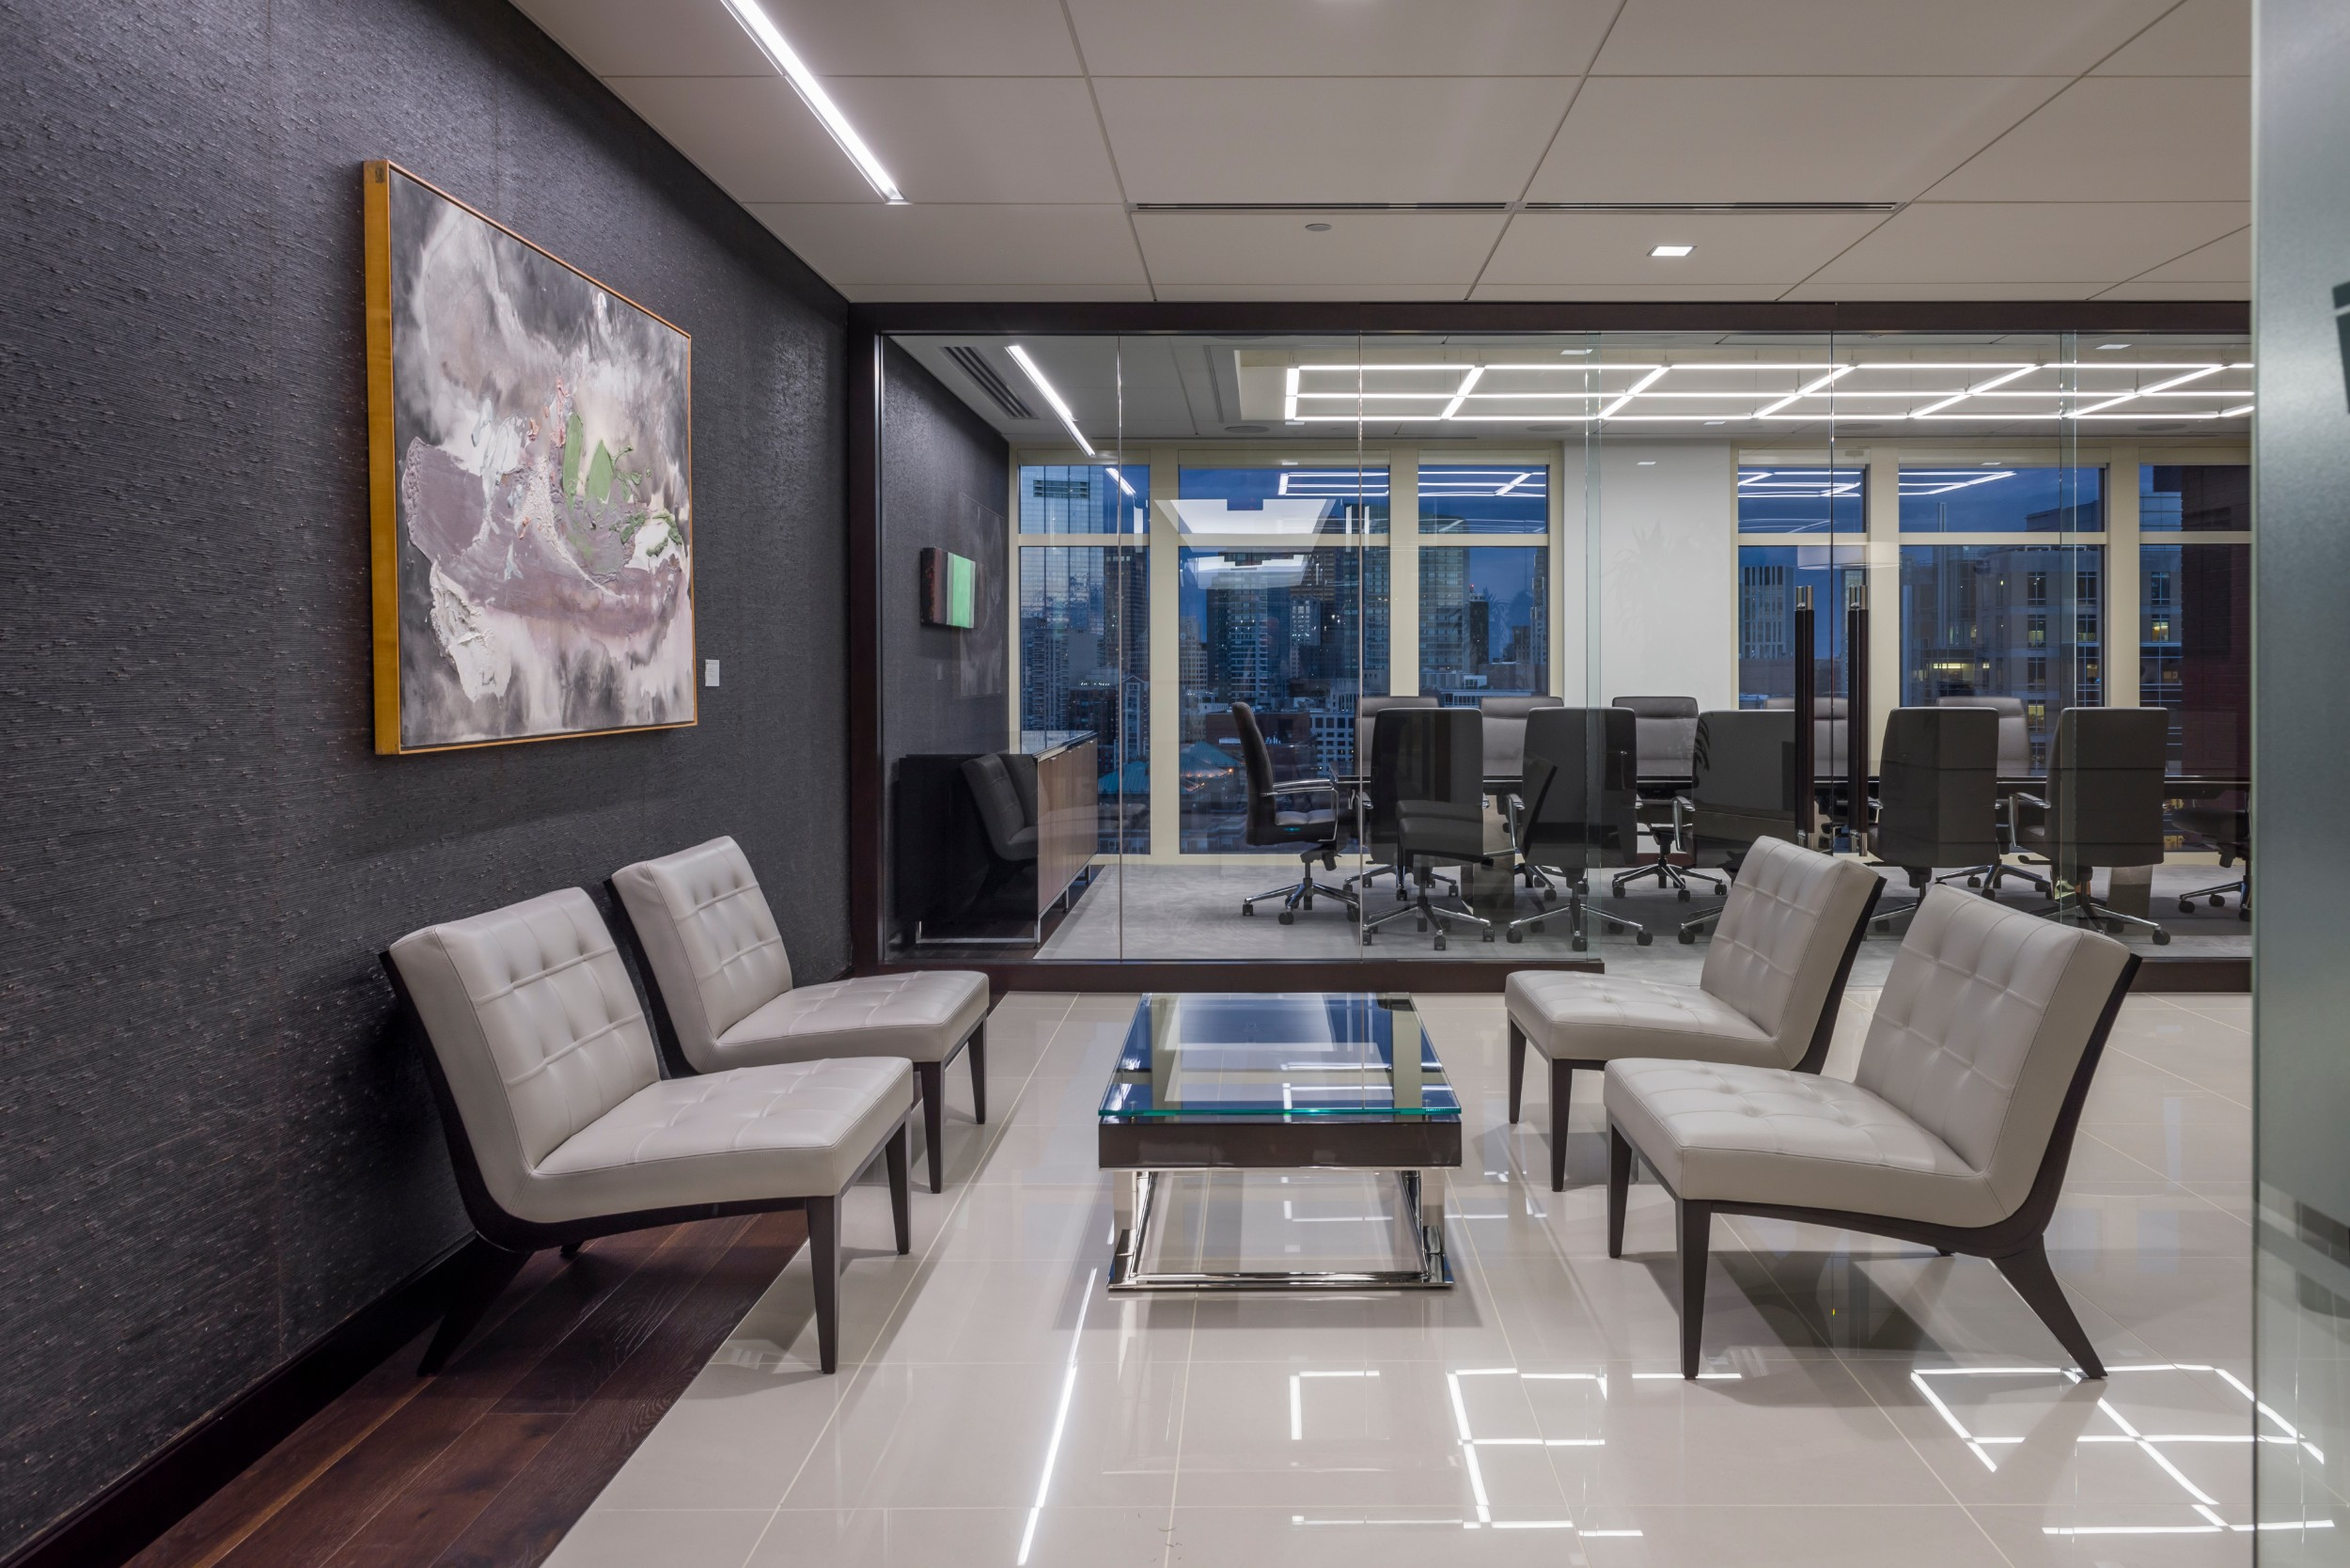 Corderman_Construction_Martignetti_Companies_Interior_Office_Buildout_Reception_Seating.jpg